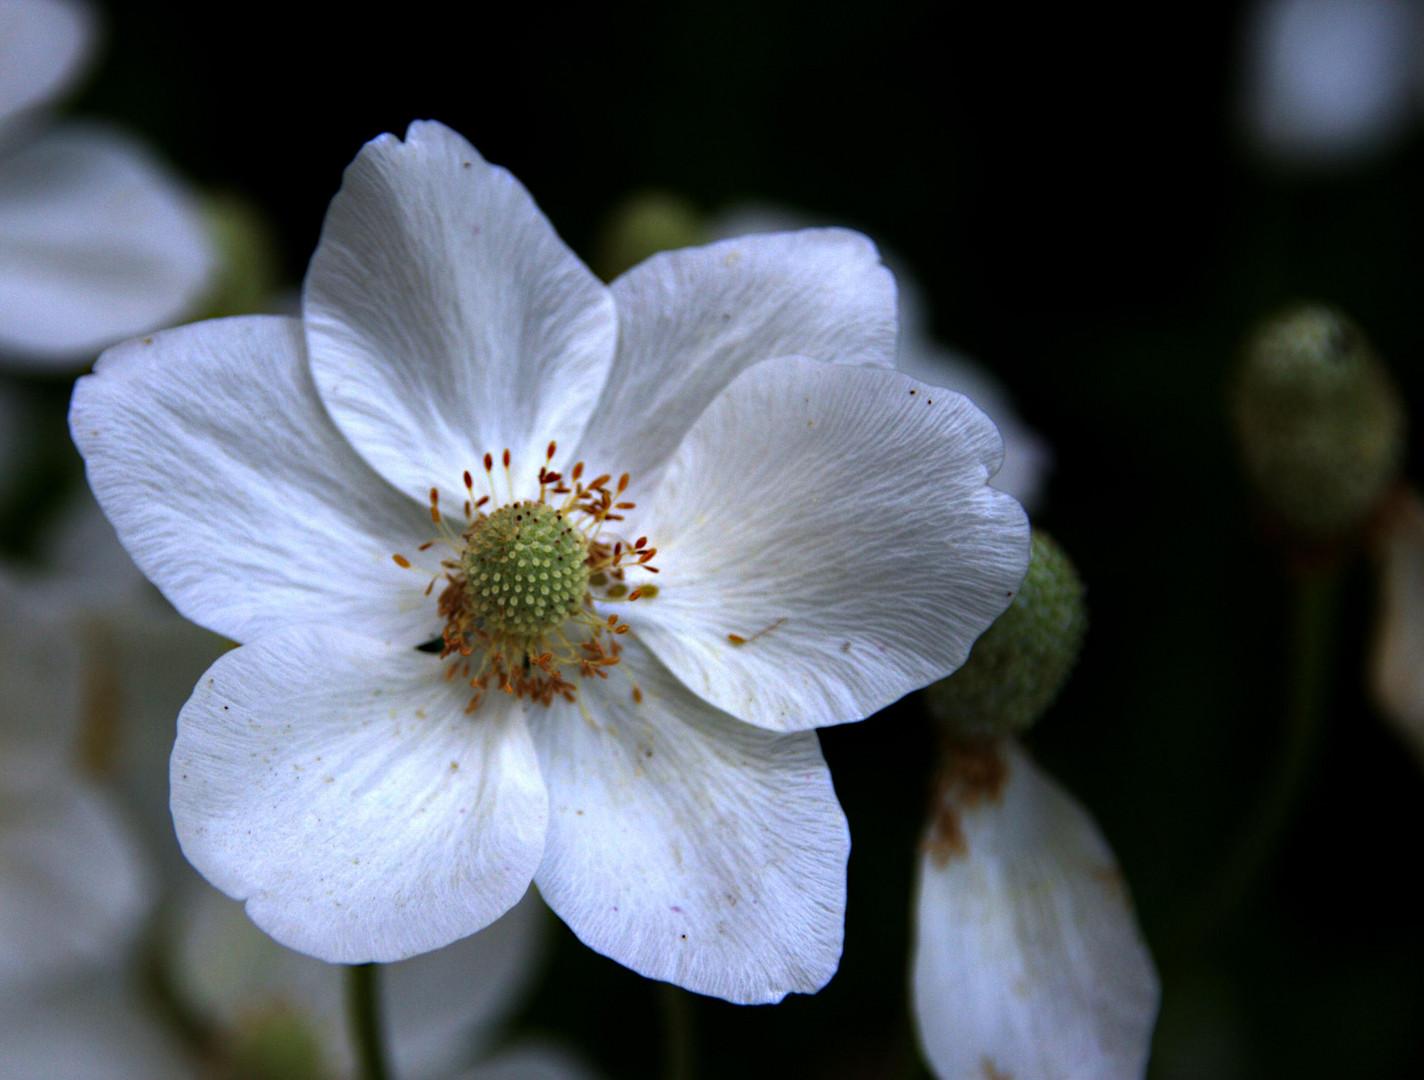 Belle du jardin